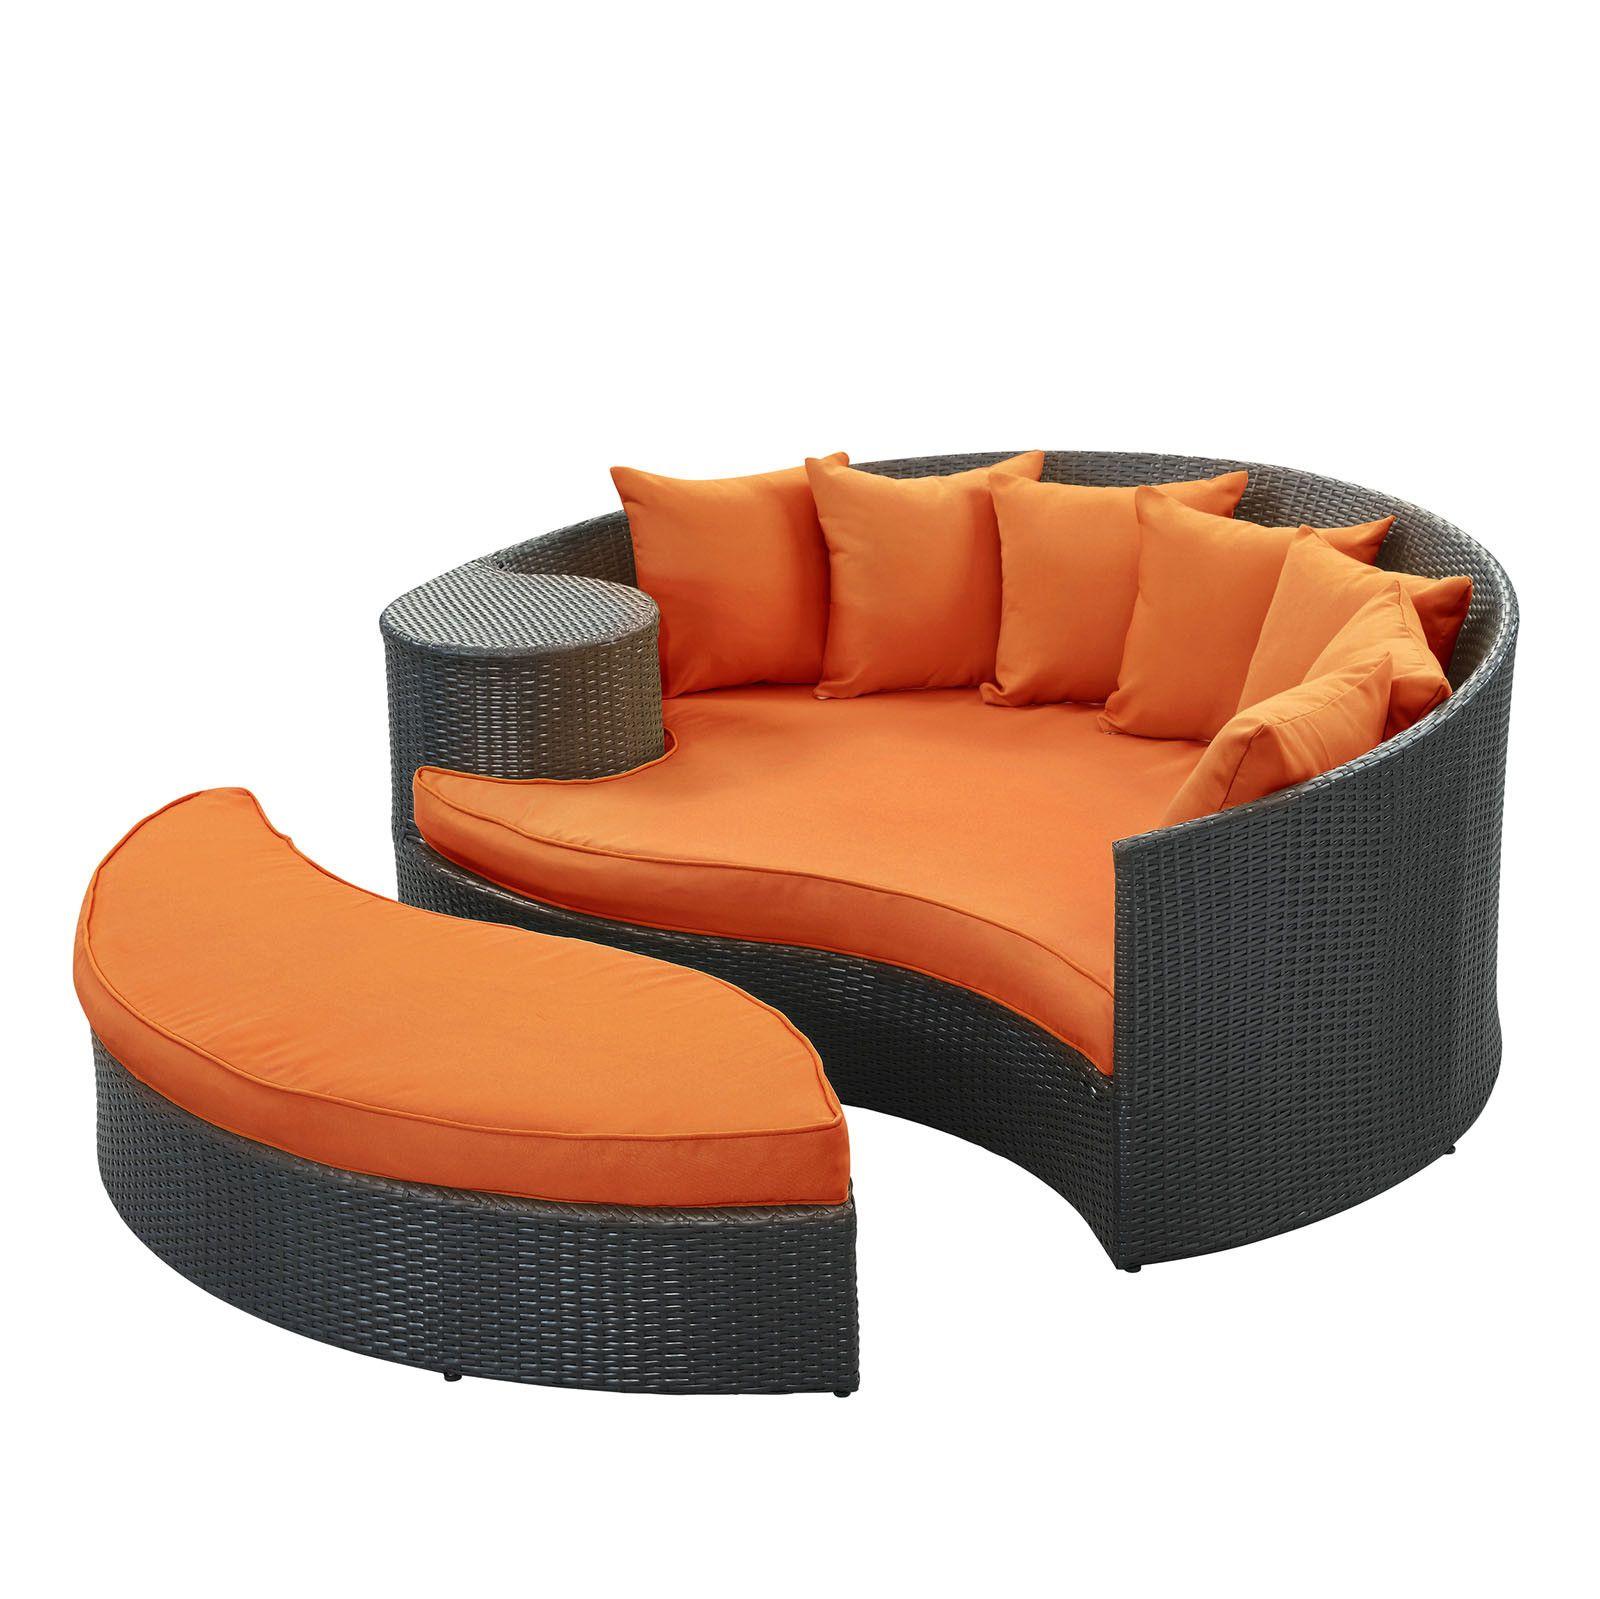 Lexmod Taiji Outdoor Wicker Patio Daybed With Ottoman In Espresso With Orange Cushions Crowdz Outdoor Daybed Patio Daybed Patio Lounge Chairs